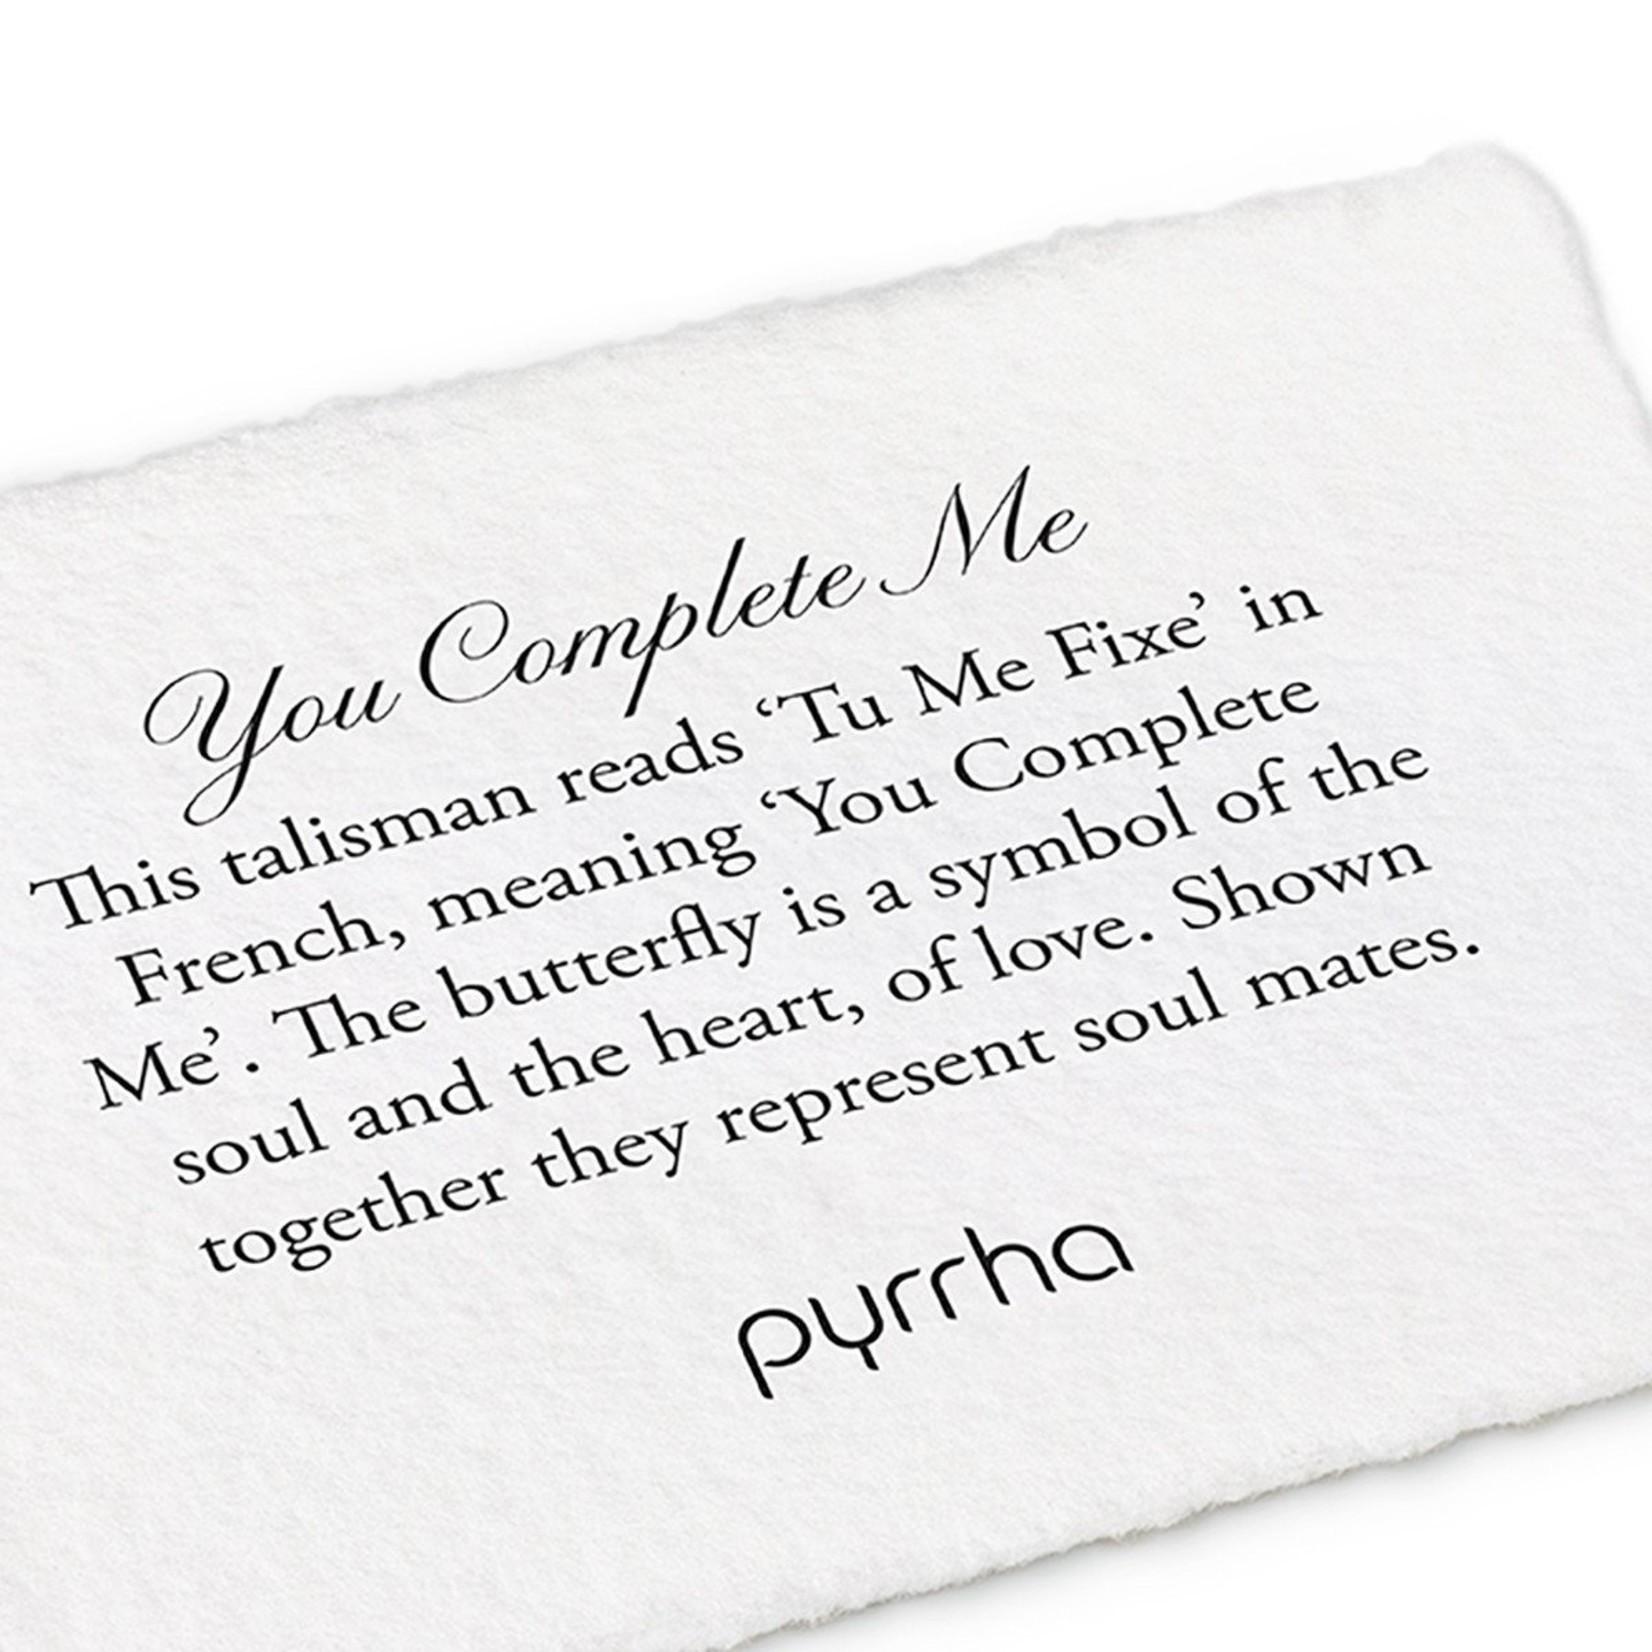 Pyrrha You Complete Me Talisman